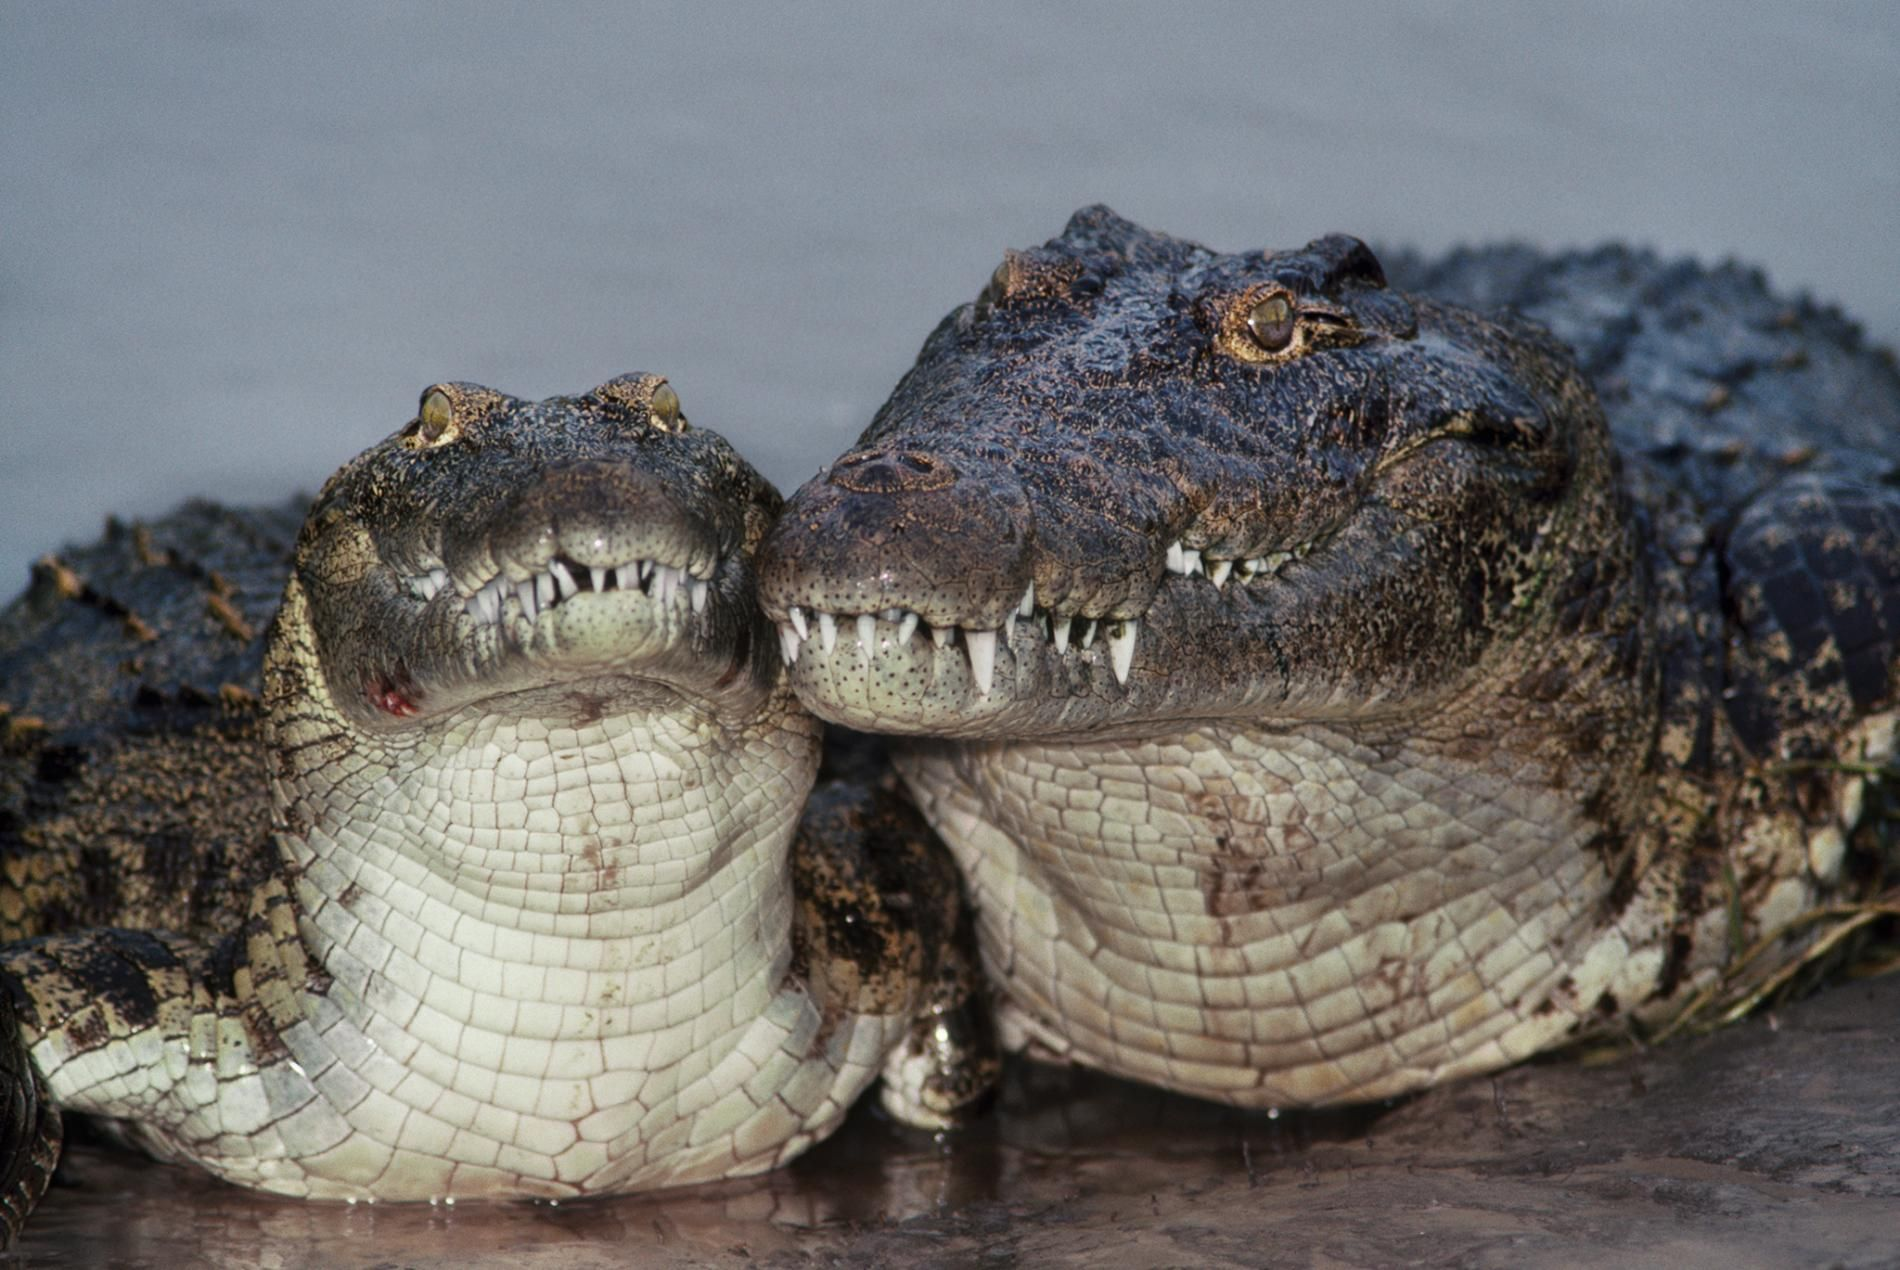 New Crocodile Species Found Hiding In Plain Sight Crocodile